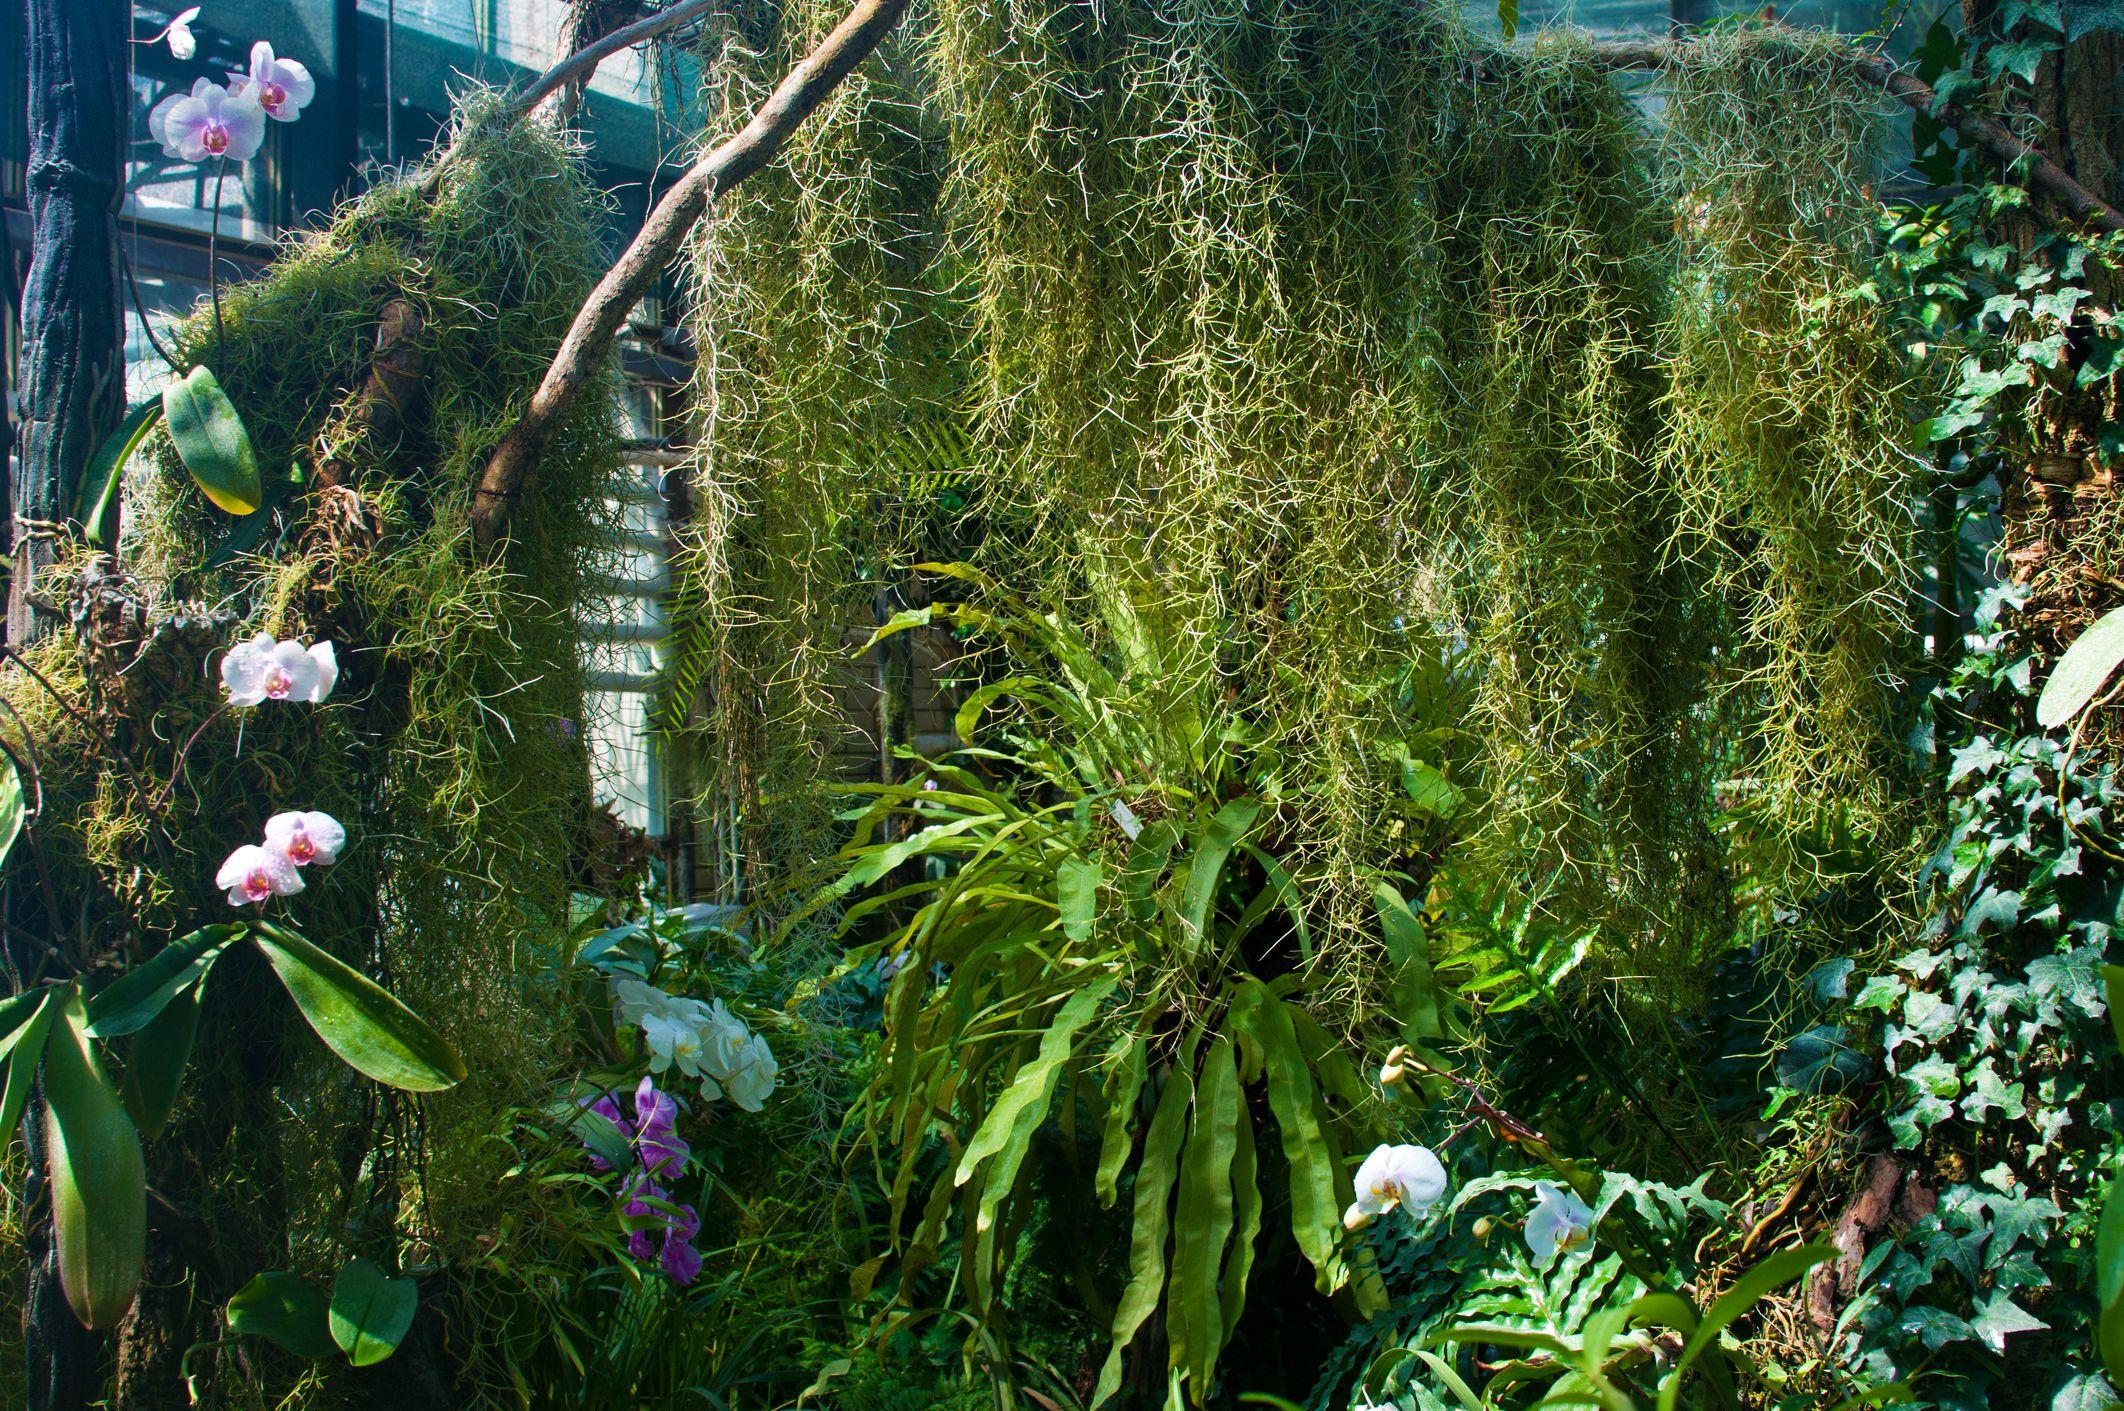 Piante Tropicali Da Interno piante tropicali da appartamento, tendenze 2019